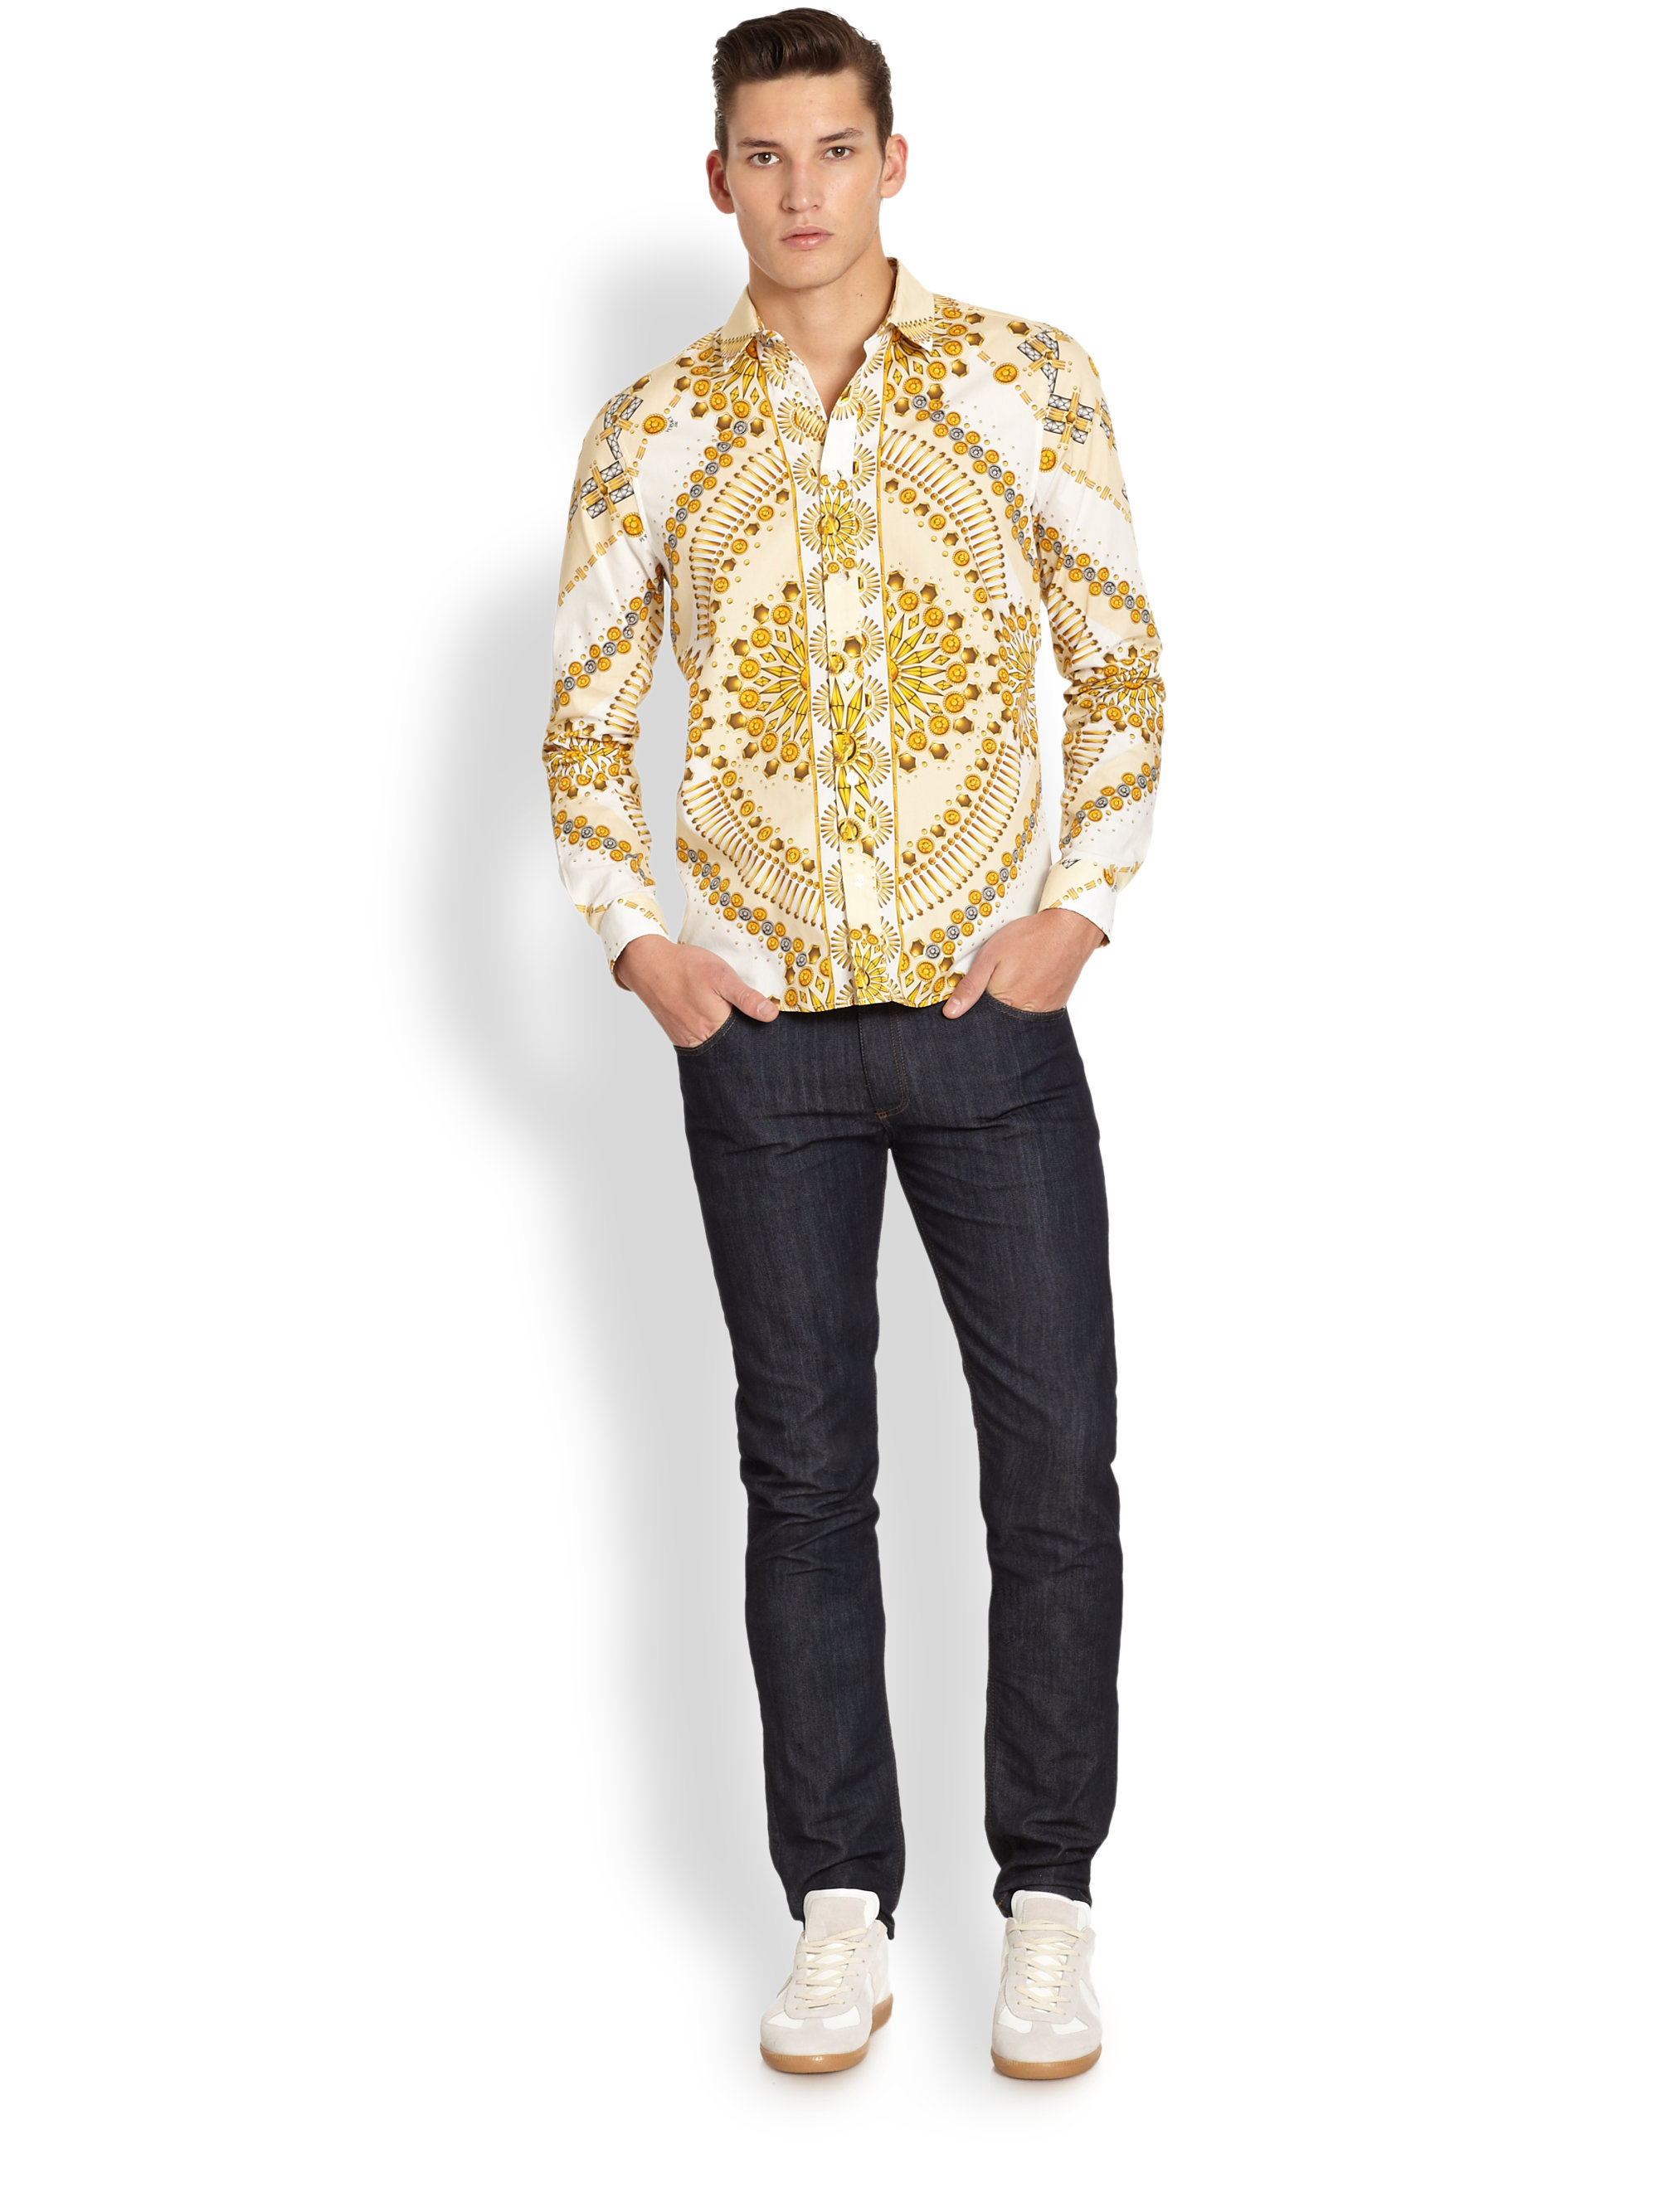 d49d5b3666a4 Versace  Women s   Men s Fashion   Fragrance